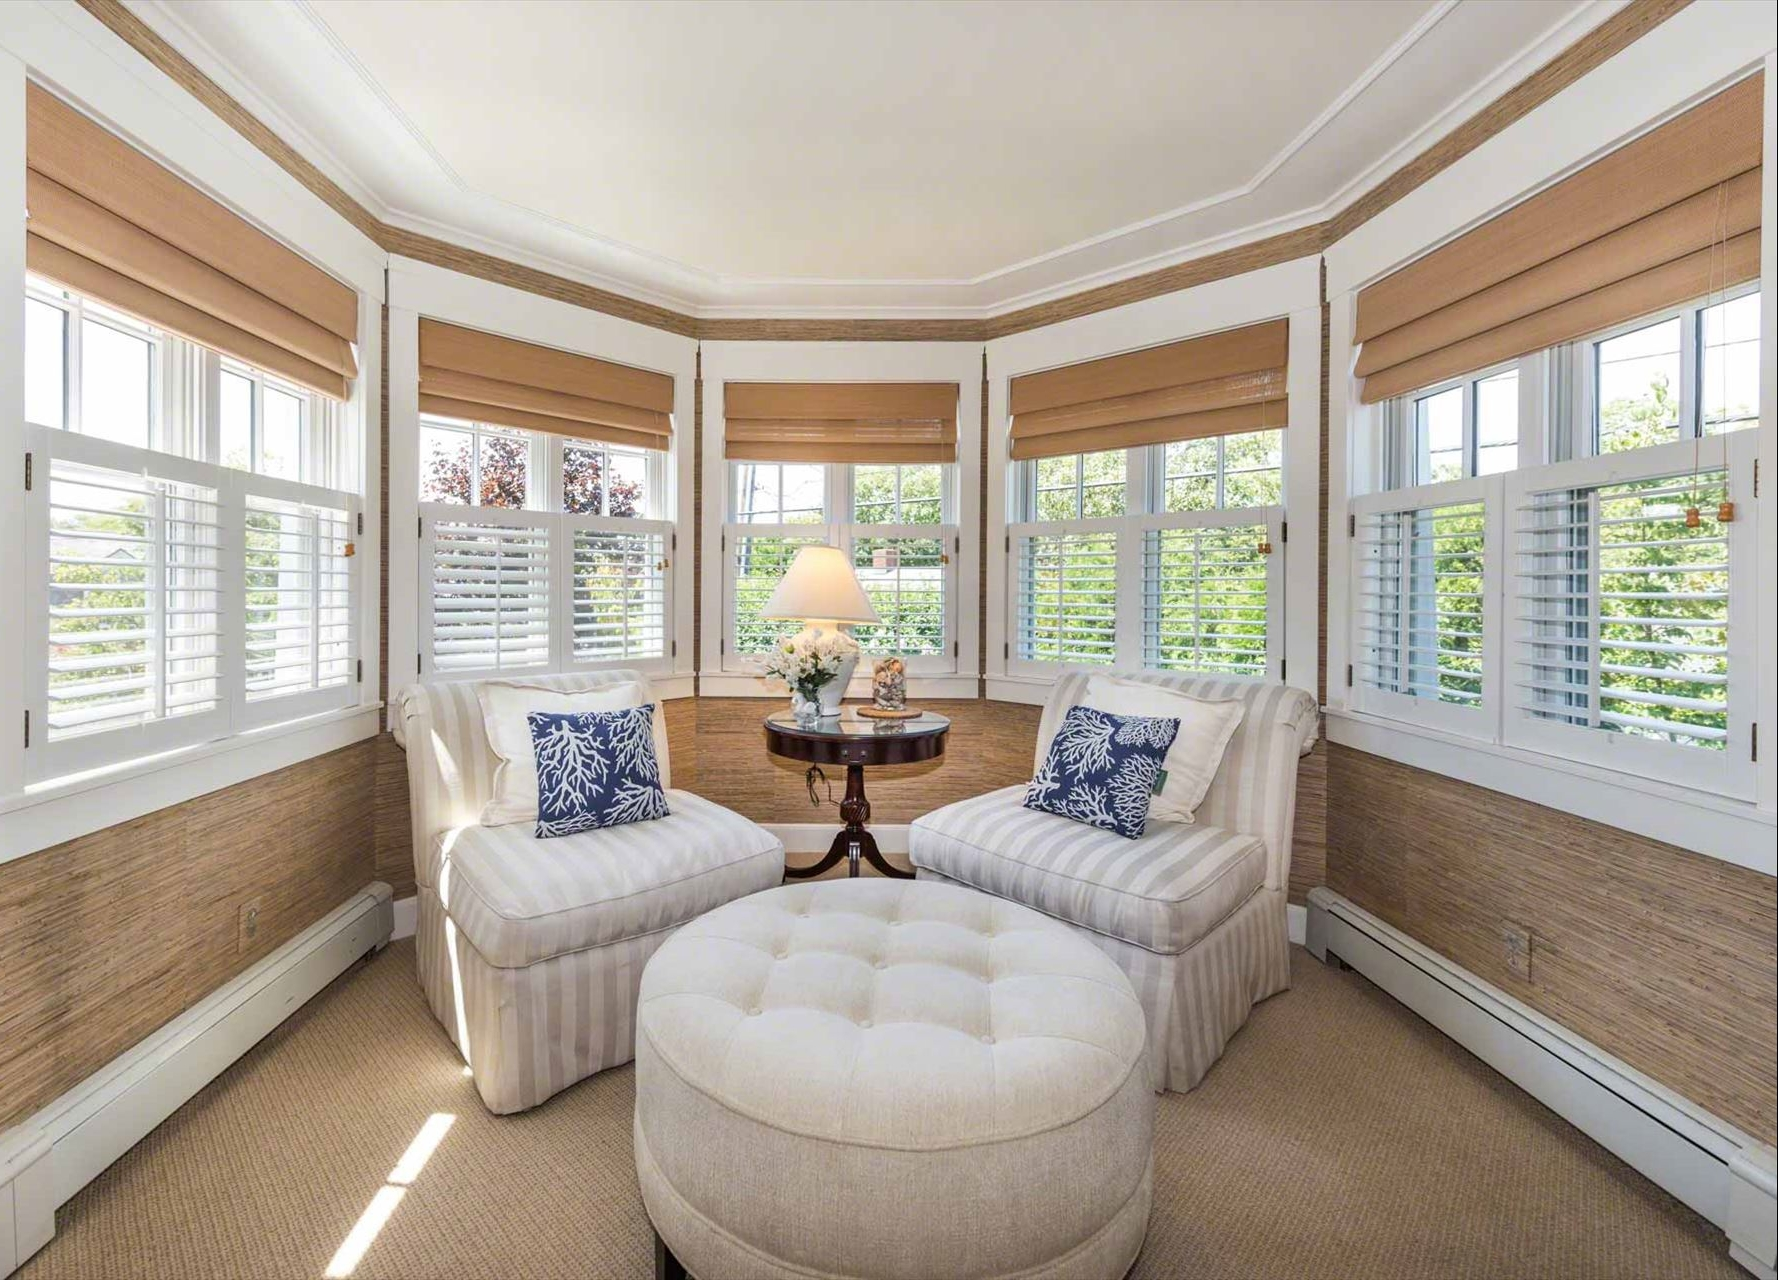 Colonial_Octagonal_Seating_Area_Windows.jpg